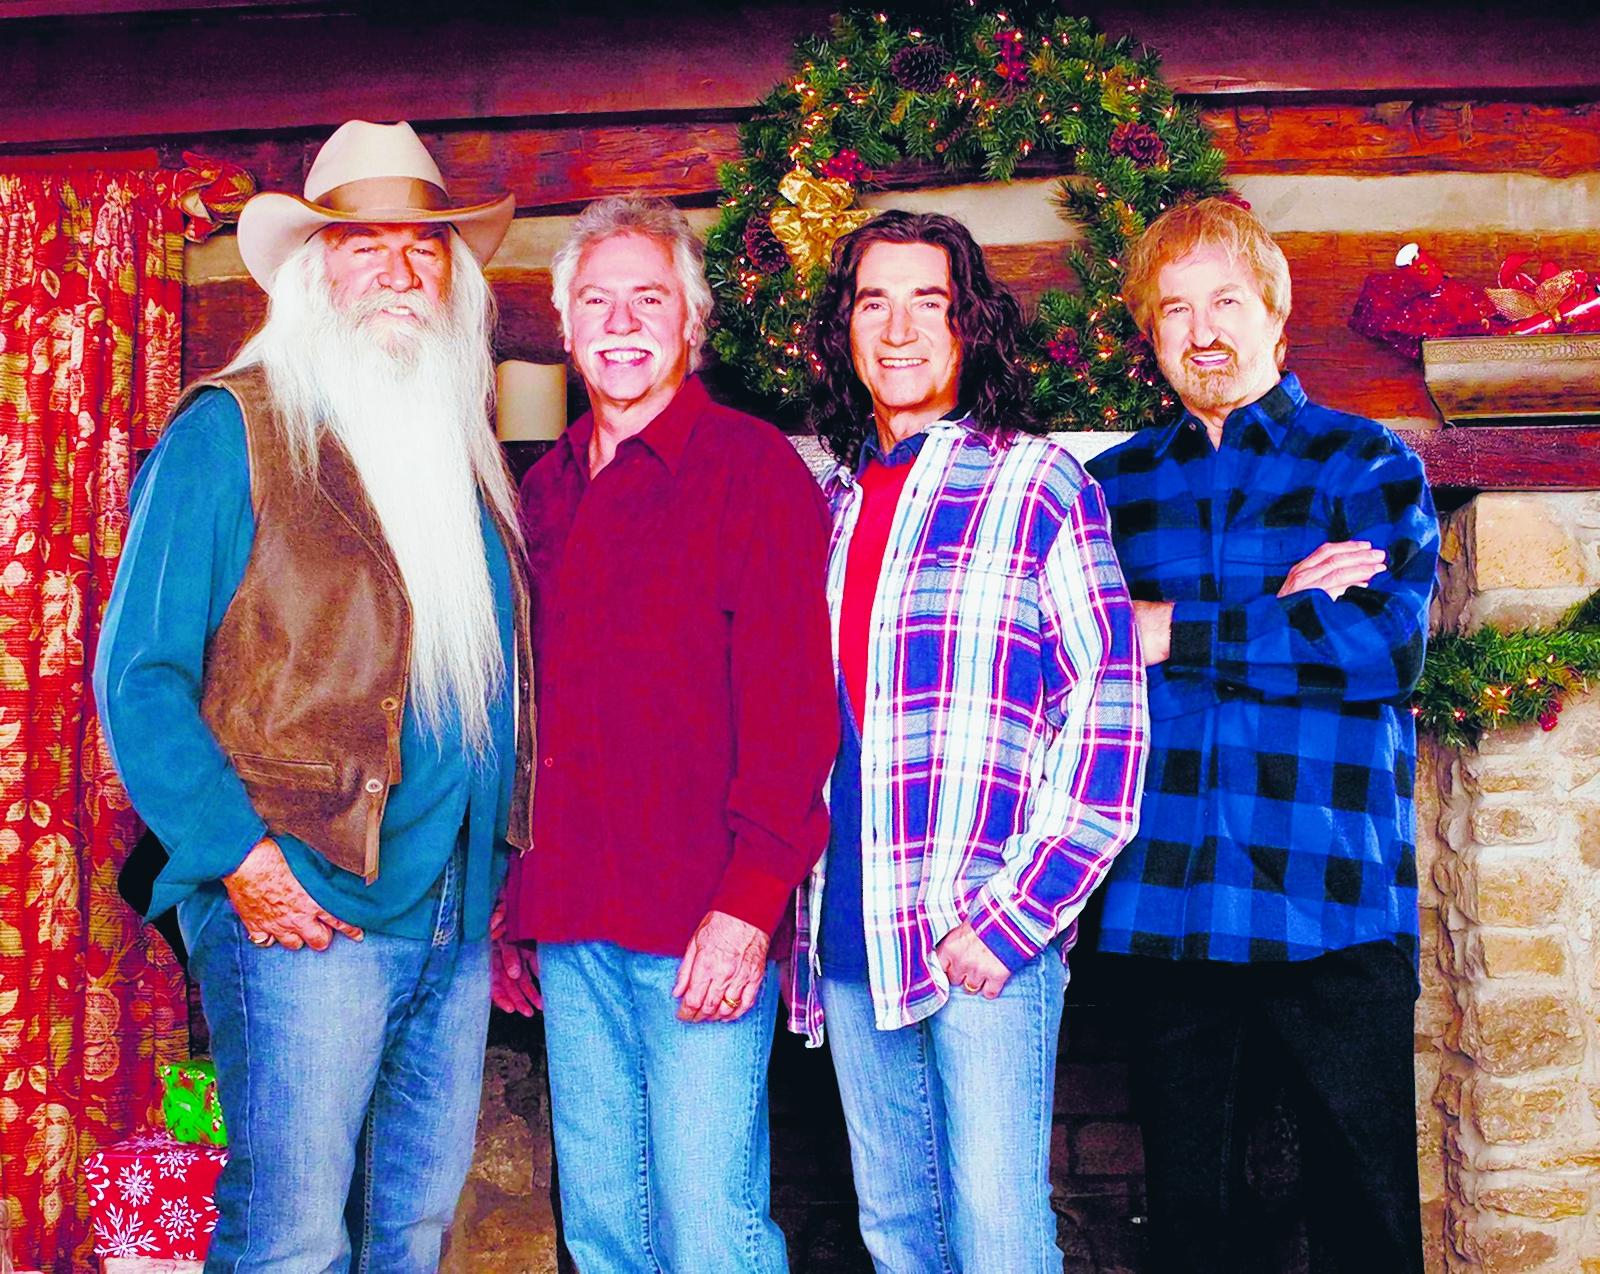 Oak Ridge Boys bringing Christmas to Stranahan Theater on Monday ...